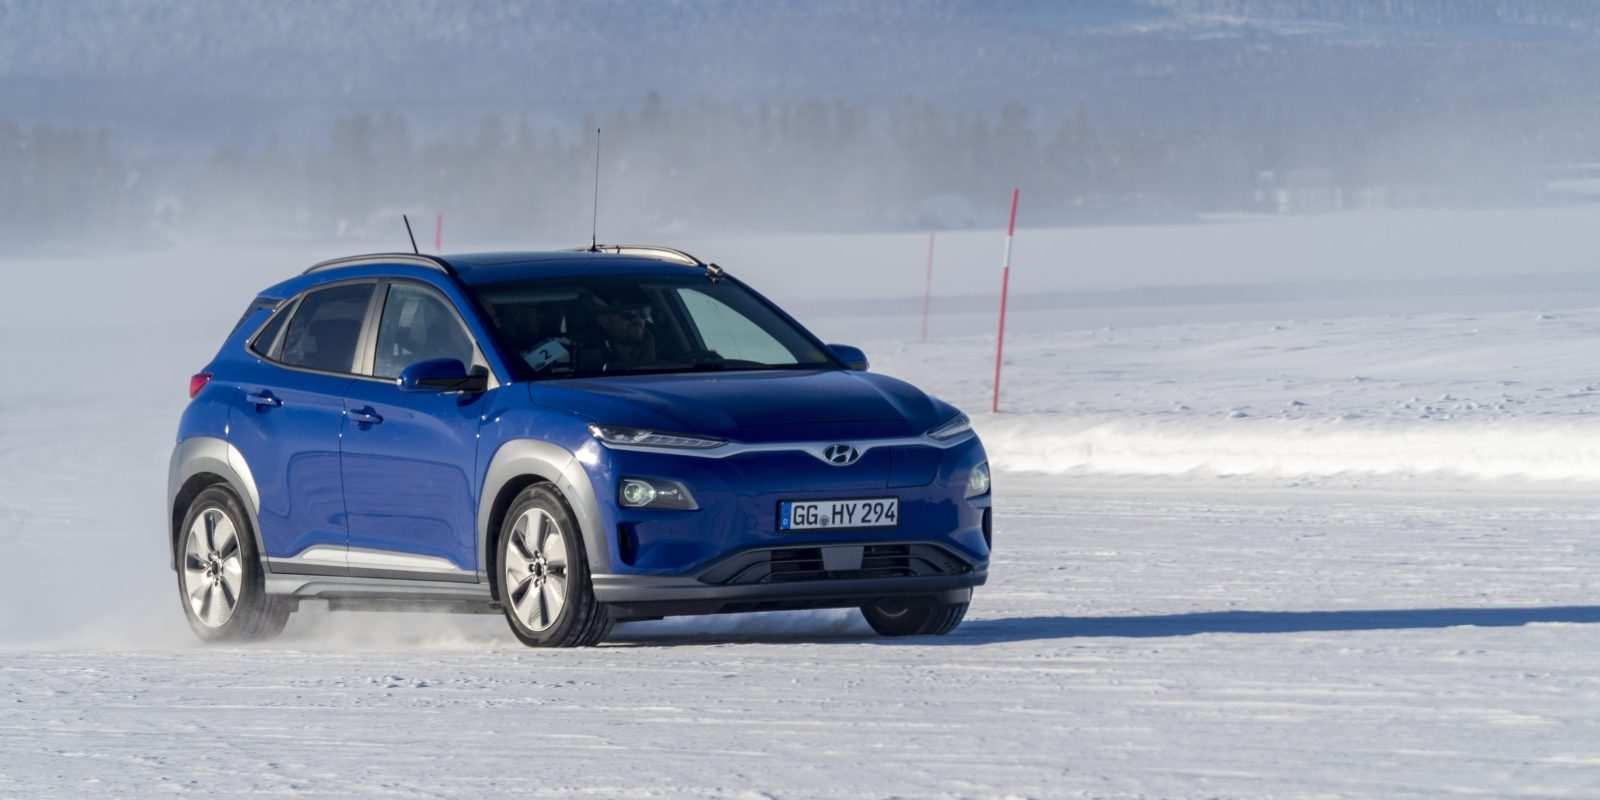 20 Best Review Hyundai Kona Ev 2020 Prices for Hyundai Kona Ev 2020